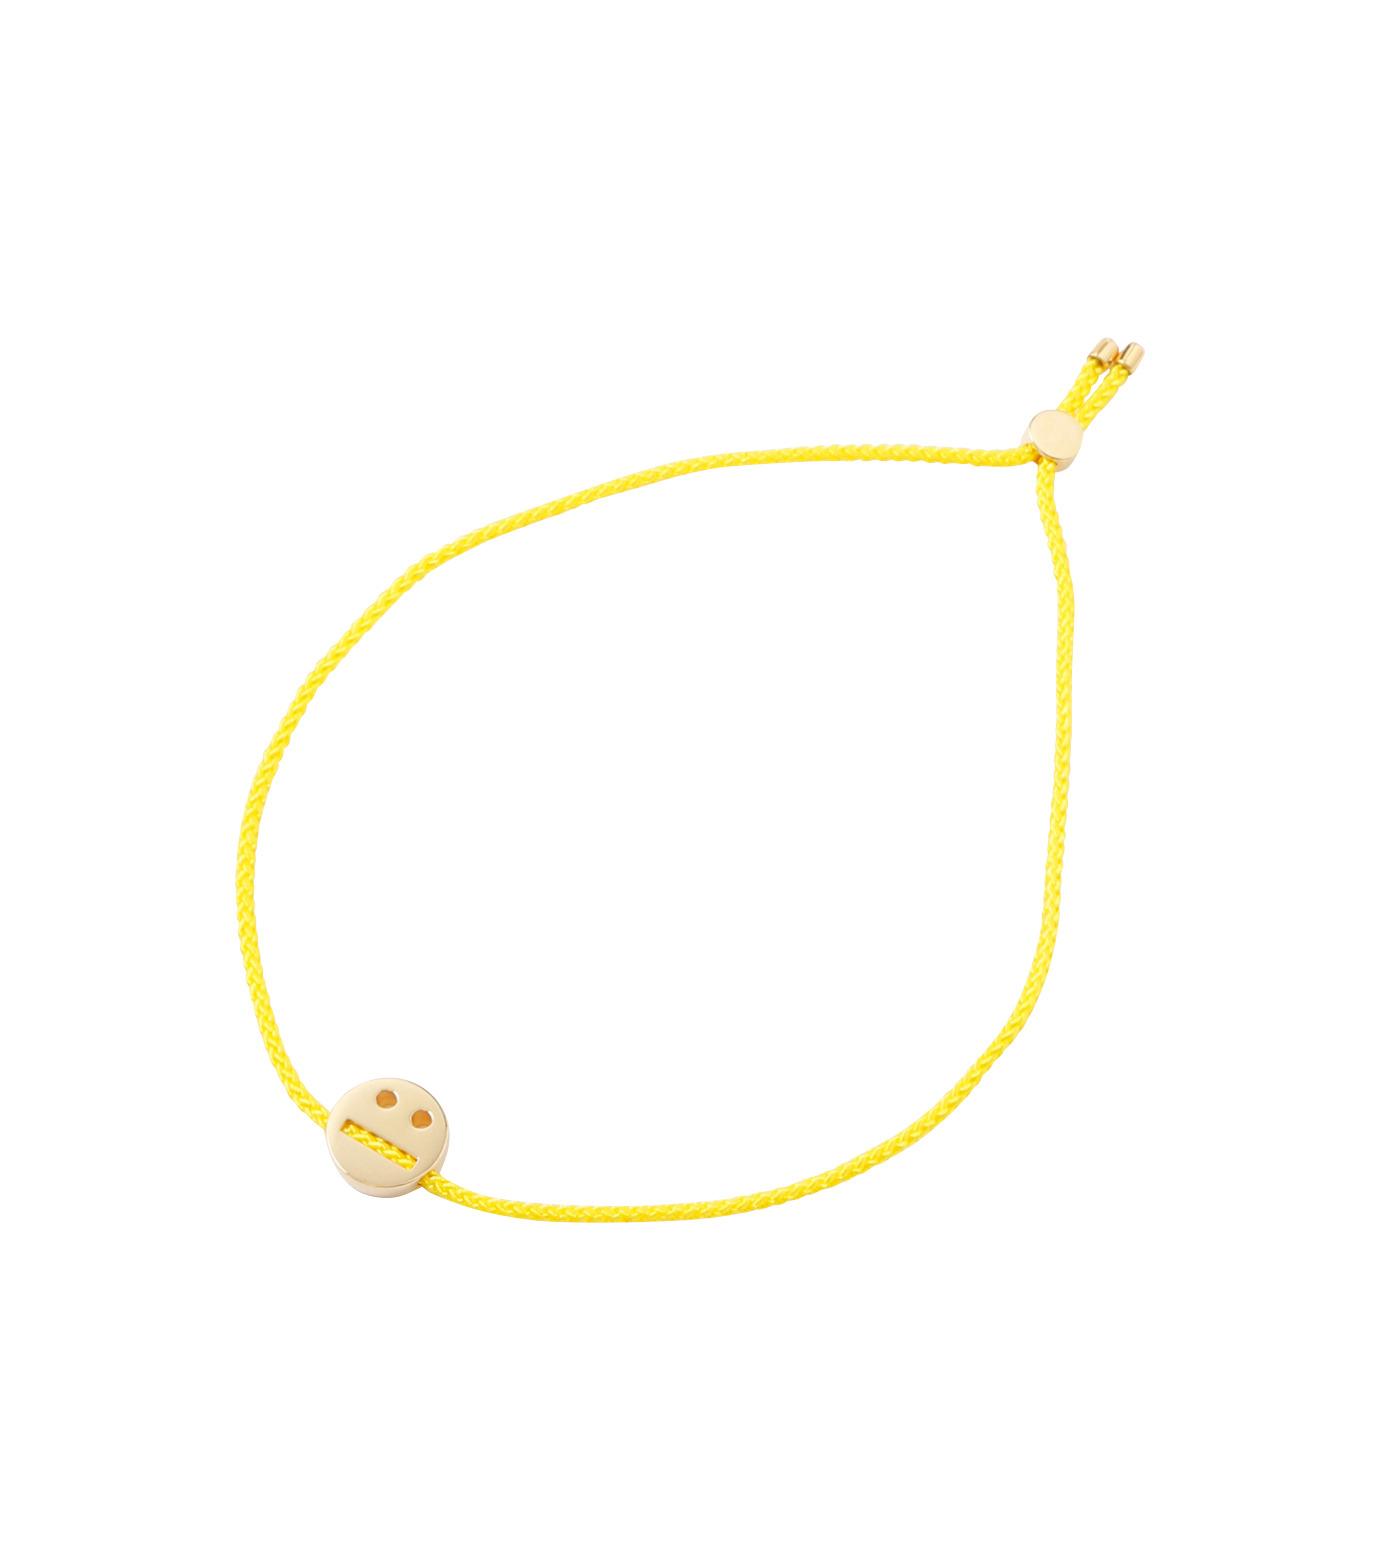 RUIFIER(ルイフフェラ)のFriends Bracelet Gold-YELLOW(ブレスレット/bracelet)-BVE56VB0L-32 拡大詳細画像1